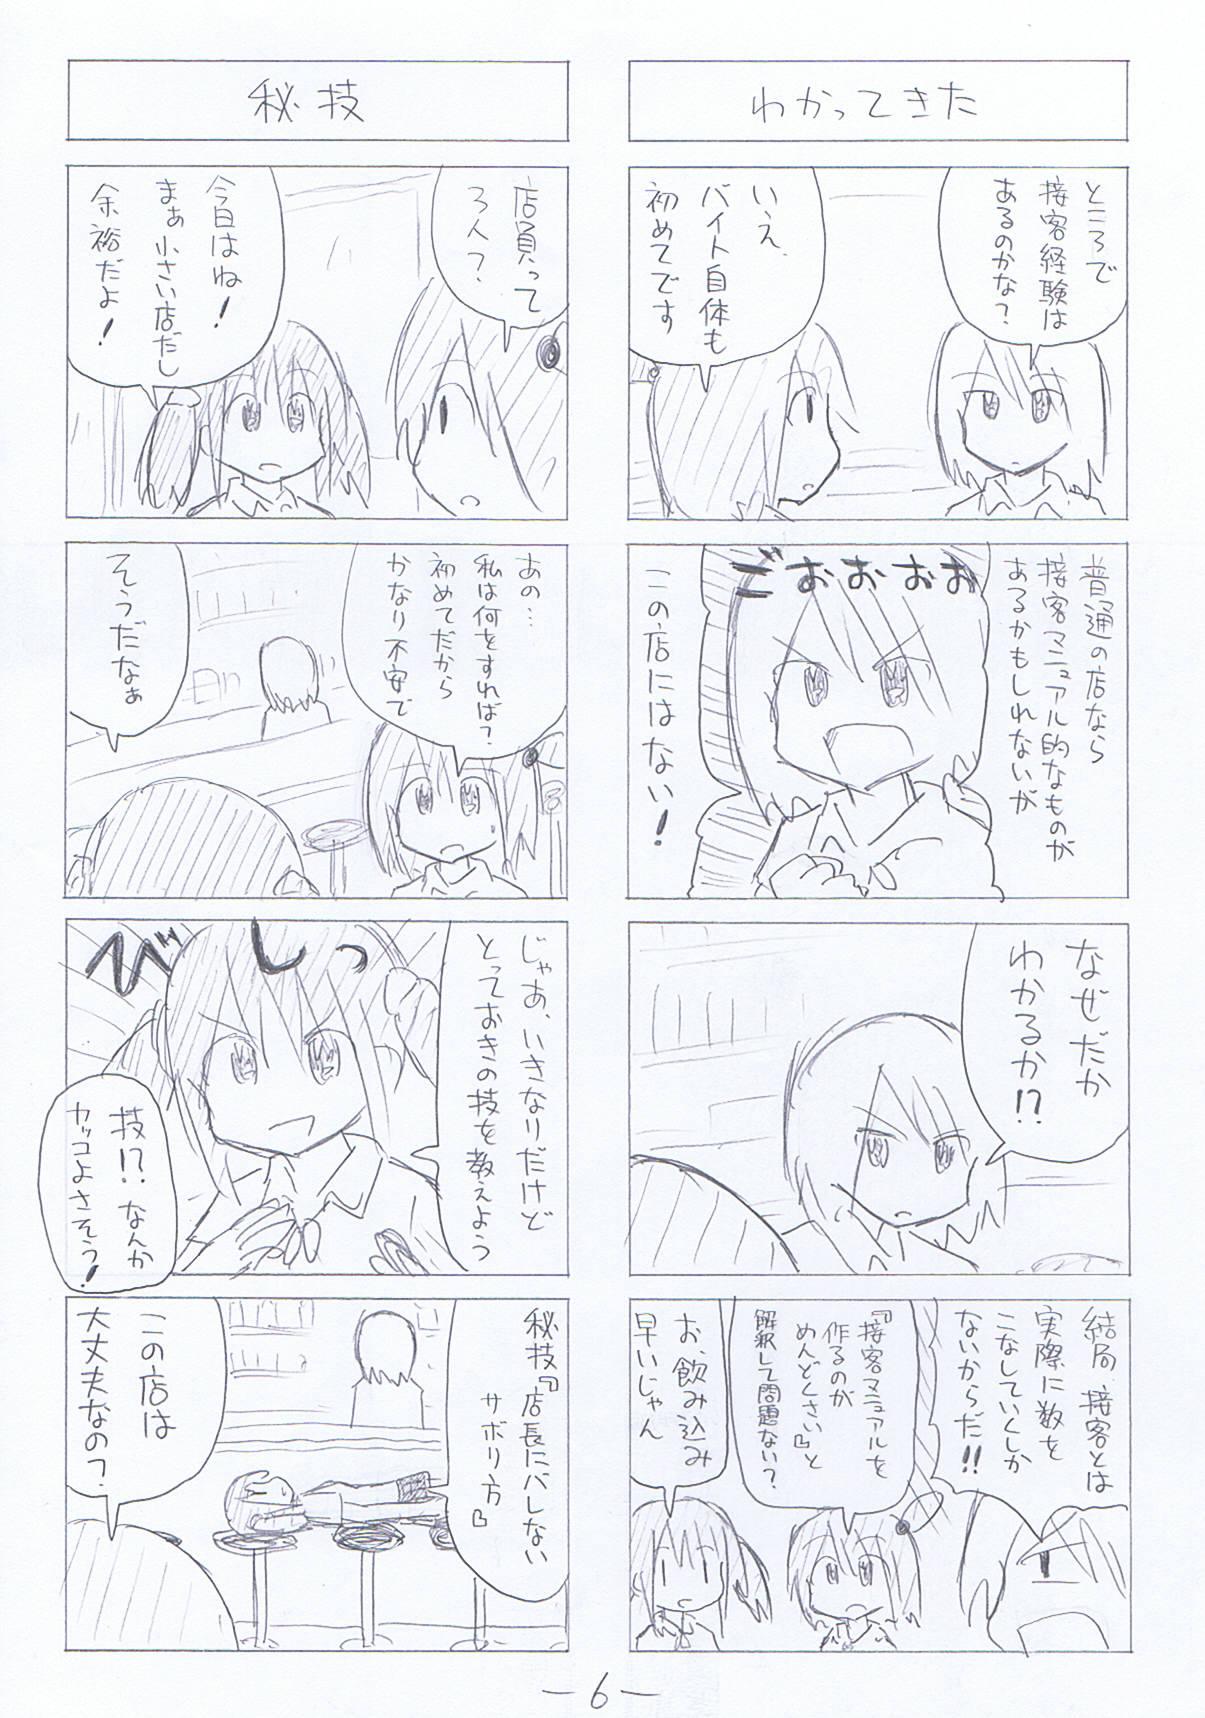 hitotoki-1-6.jpg